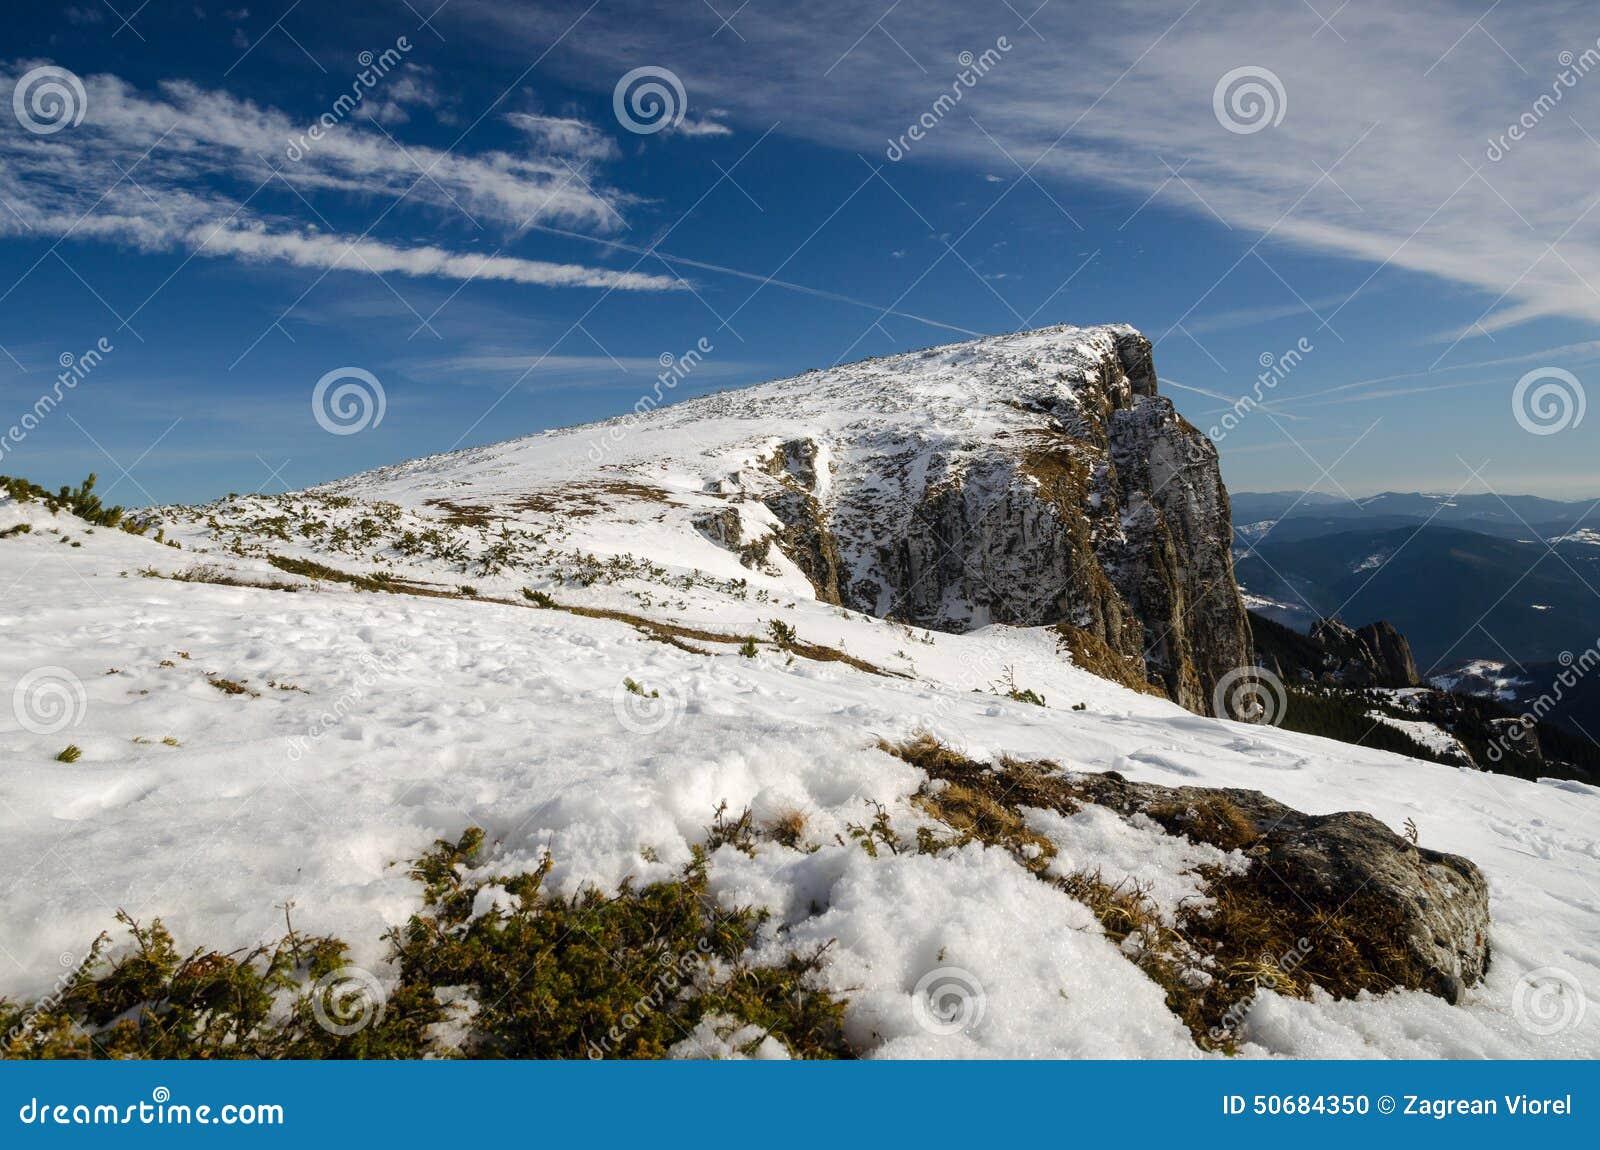 Download 与孤立旅客的山风景 库存照片. 图片 包括有 冬天, 多雪, 峰顶, 季节, 记录, 室外, 云彩, 蓝色 - 50684350